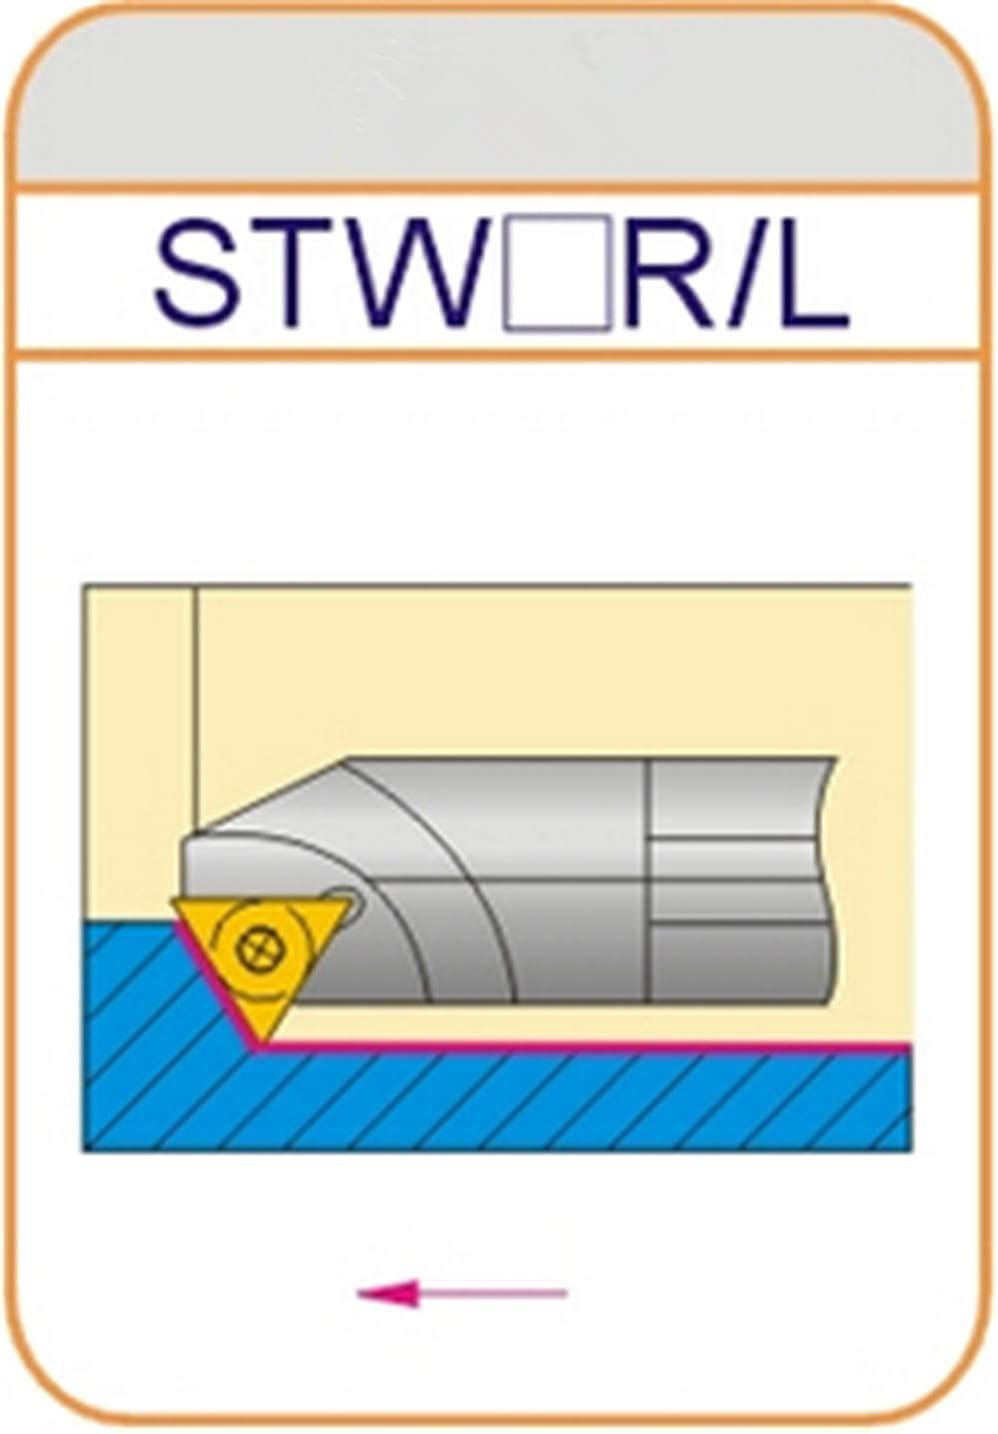 Inserts 1pc 91° S18Q-STFCR11 Index Internal Lathe Turning Holder For TC....